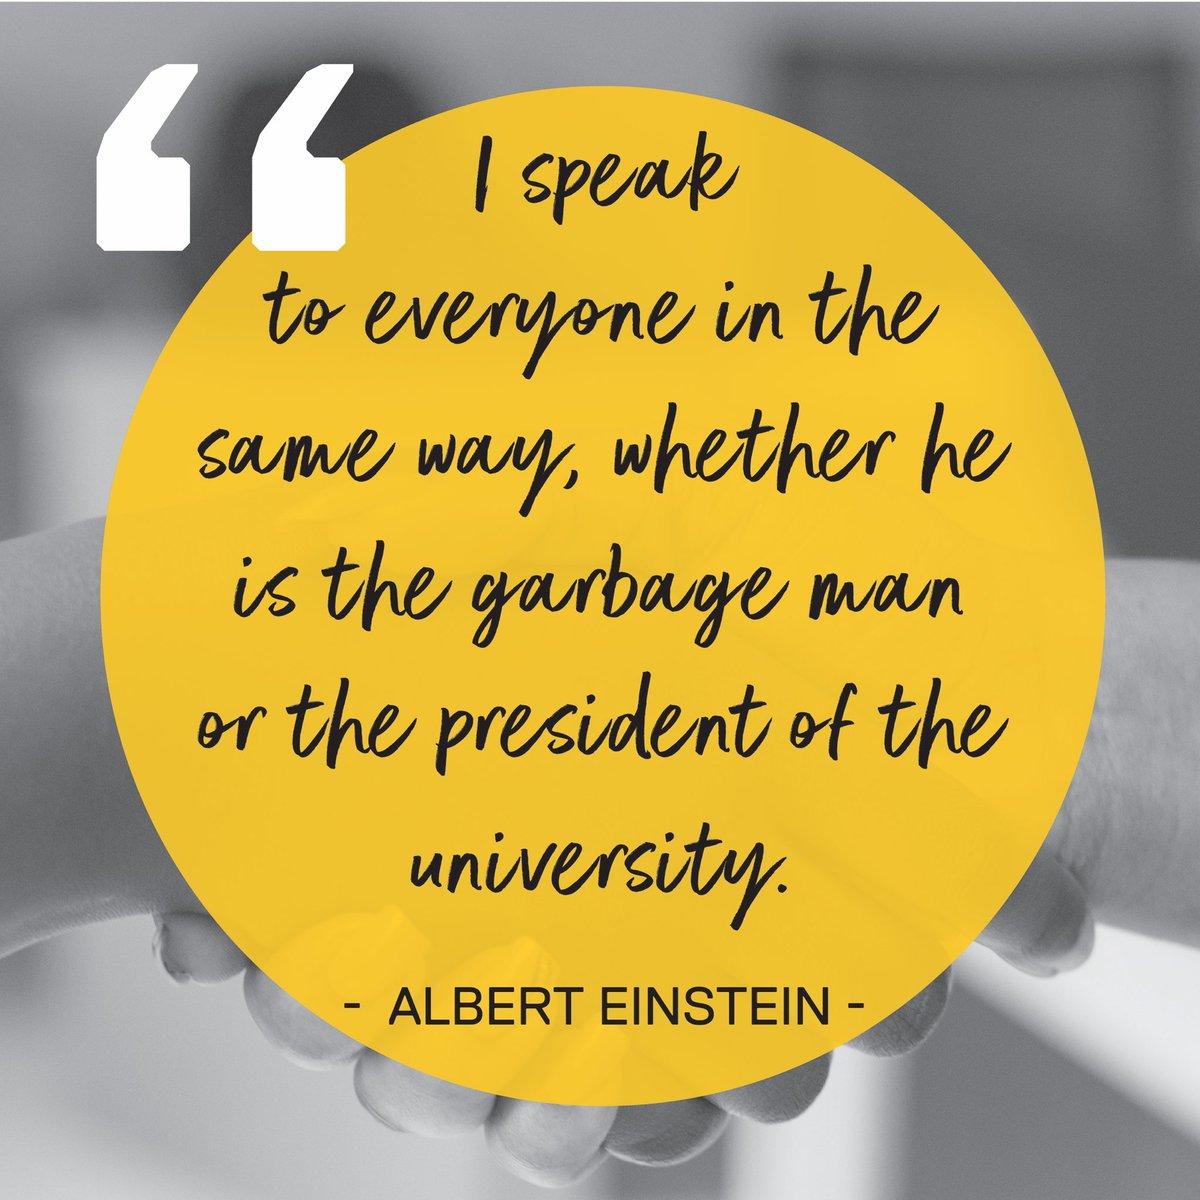 #kindness #equality #PosEd #positiveeducation #positivepsychology #inspiration